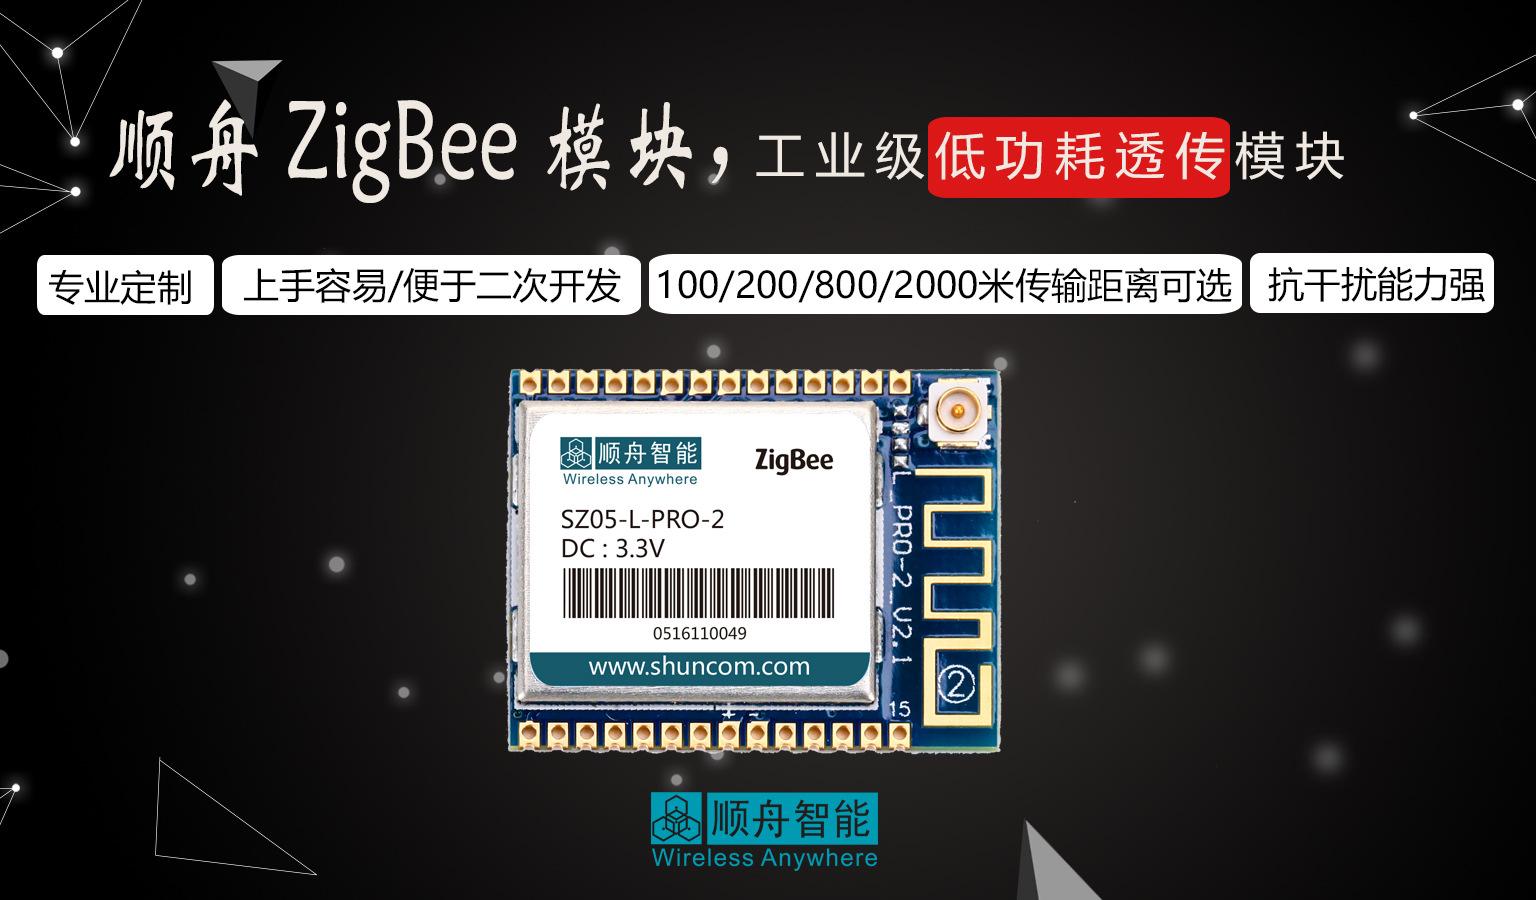 zigbee智能开关模块厂家 无线通信智能网关模块 超低低功耗抗干扰示例图2